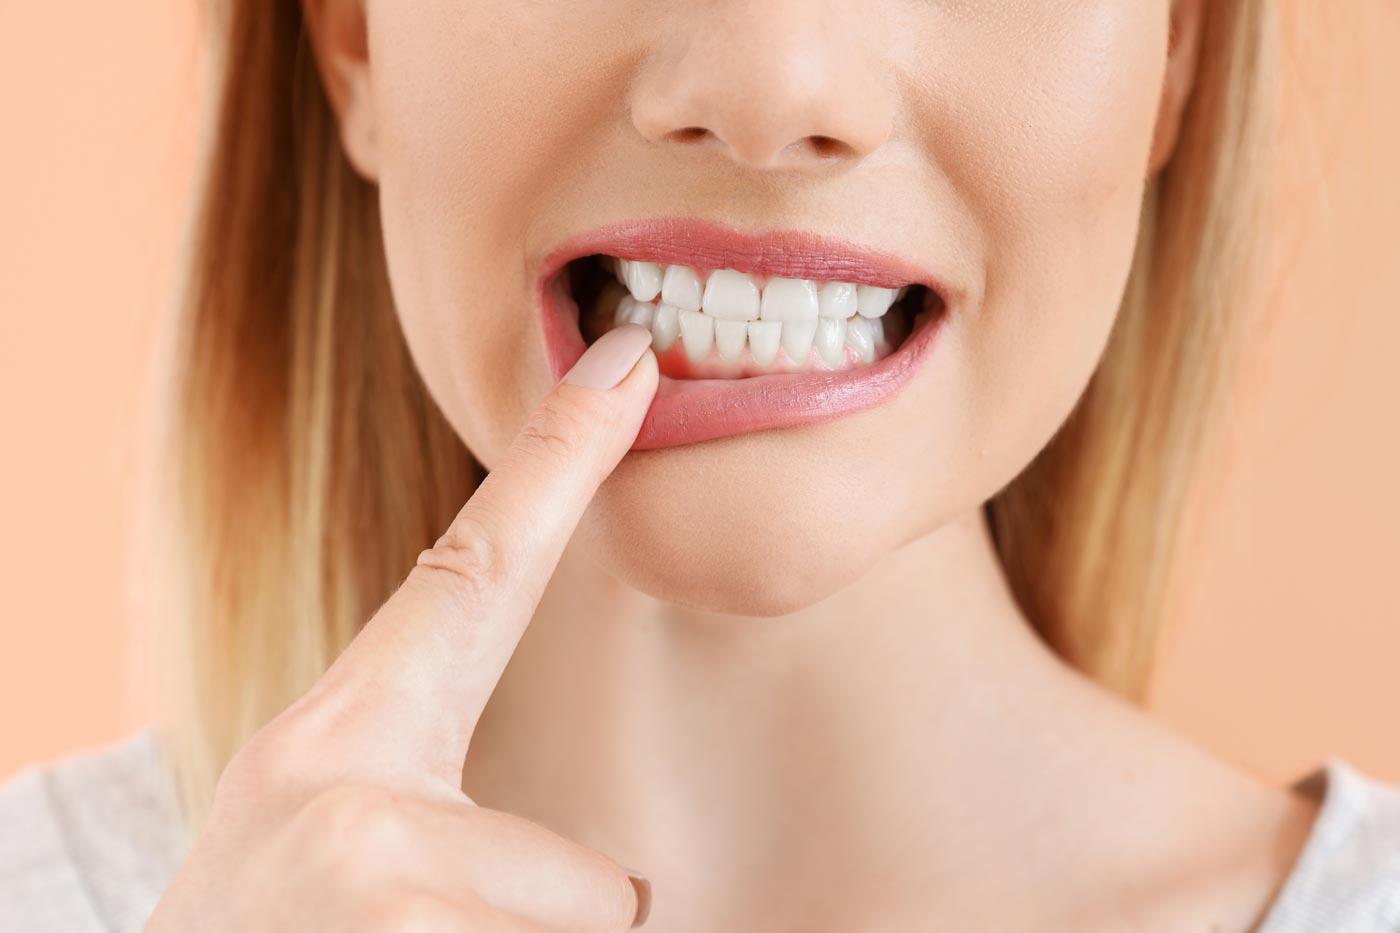 Parodontalbehandlung - Zahnarzt Dr. Kremer